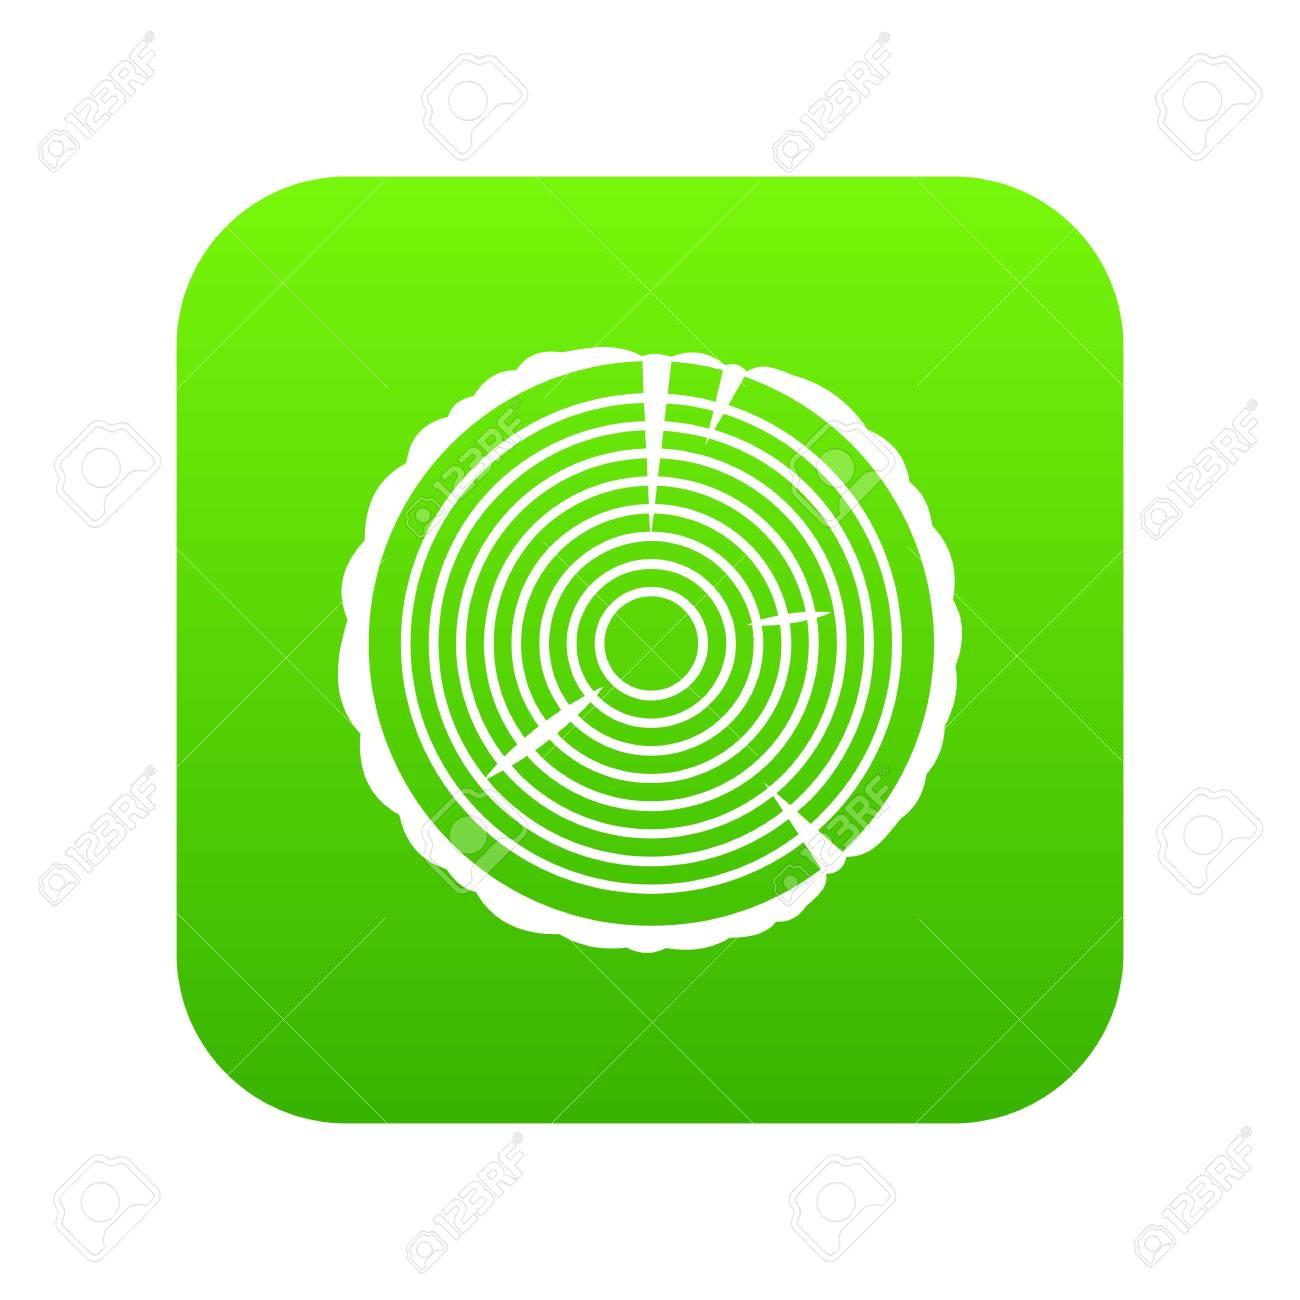 Tree Ring Icon Digital Green Royalty Free Cliparts Vectors And